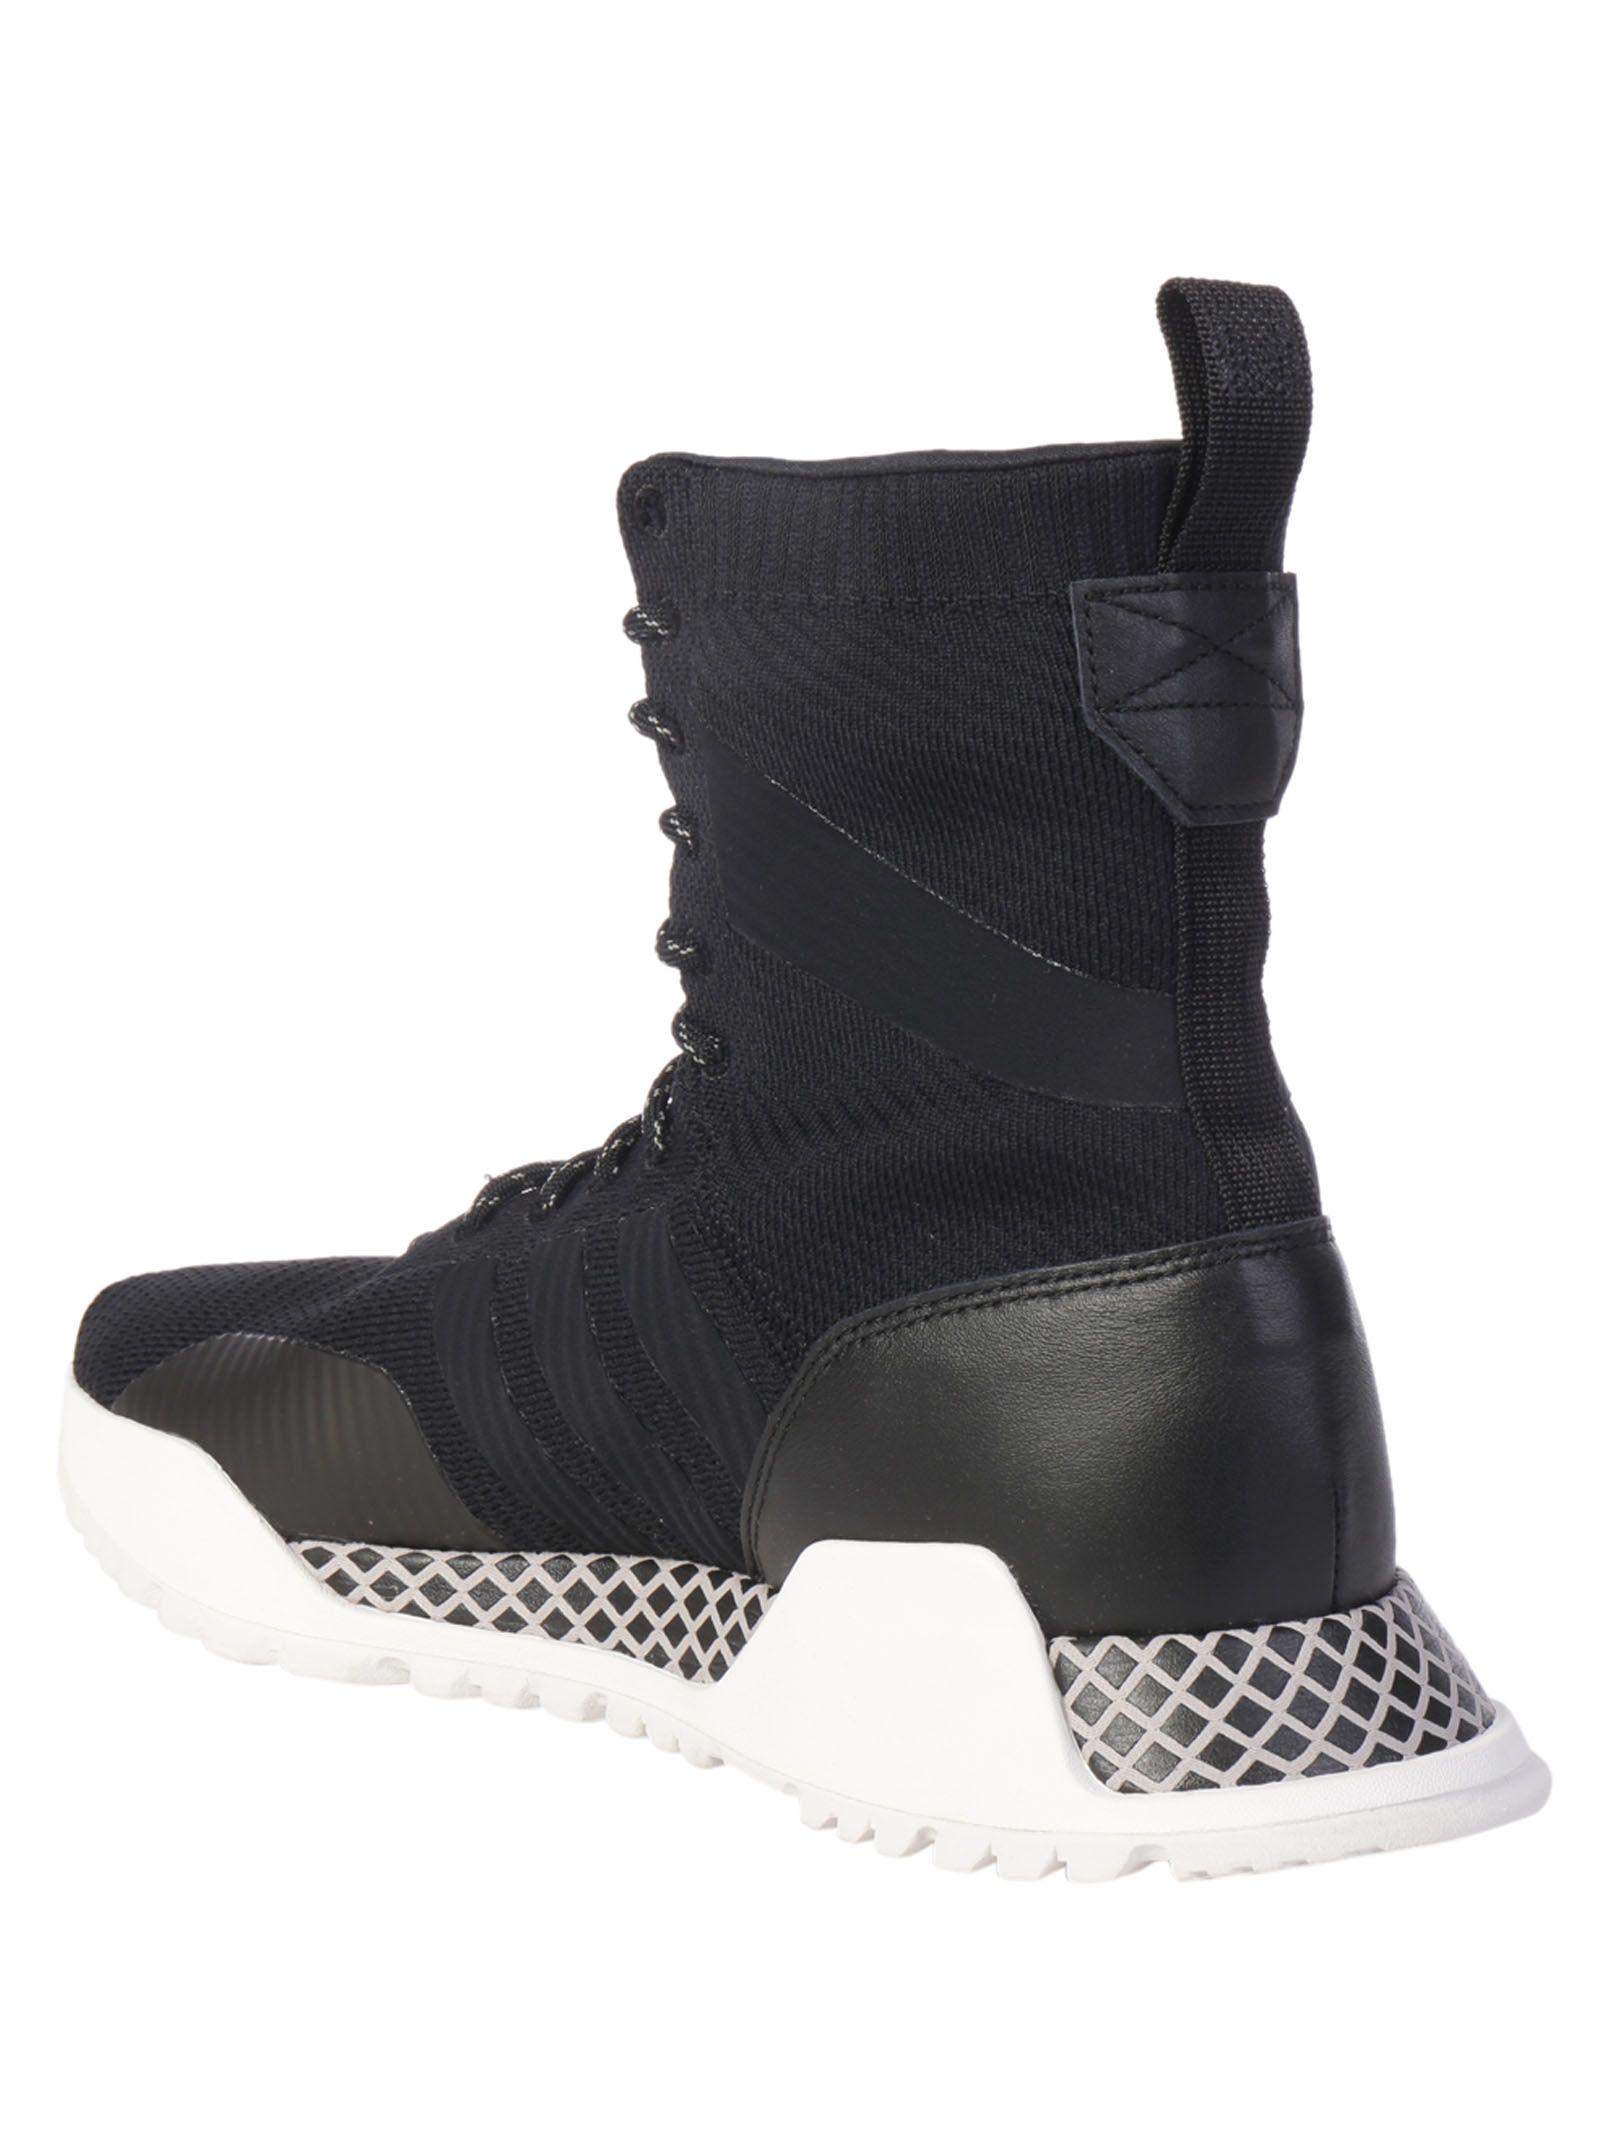 Adidas Chaussures De Sport Haut Atric ep4aQYzqeW